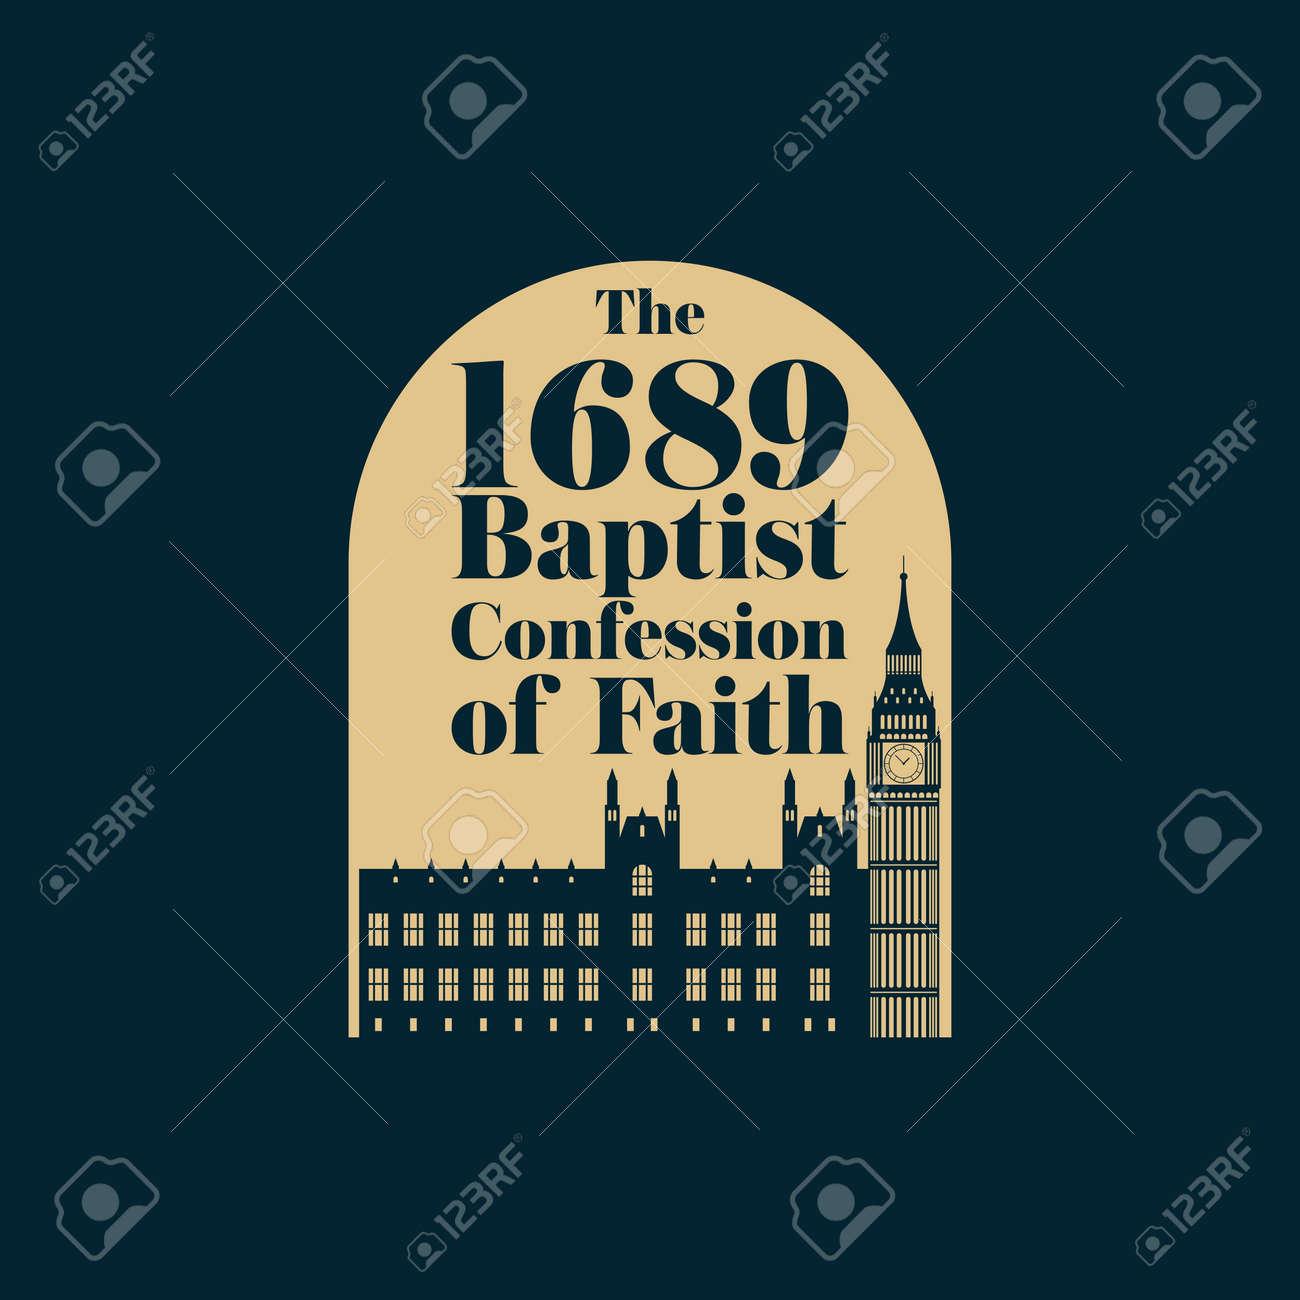 Reformed christian art. The 1689 Baptist Confession of Faith. - 166911203